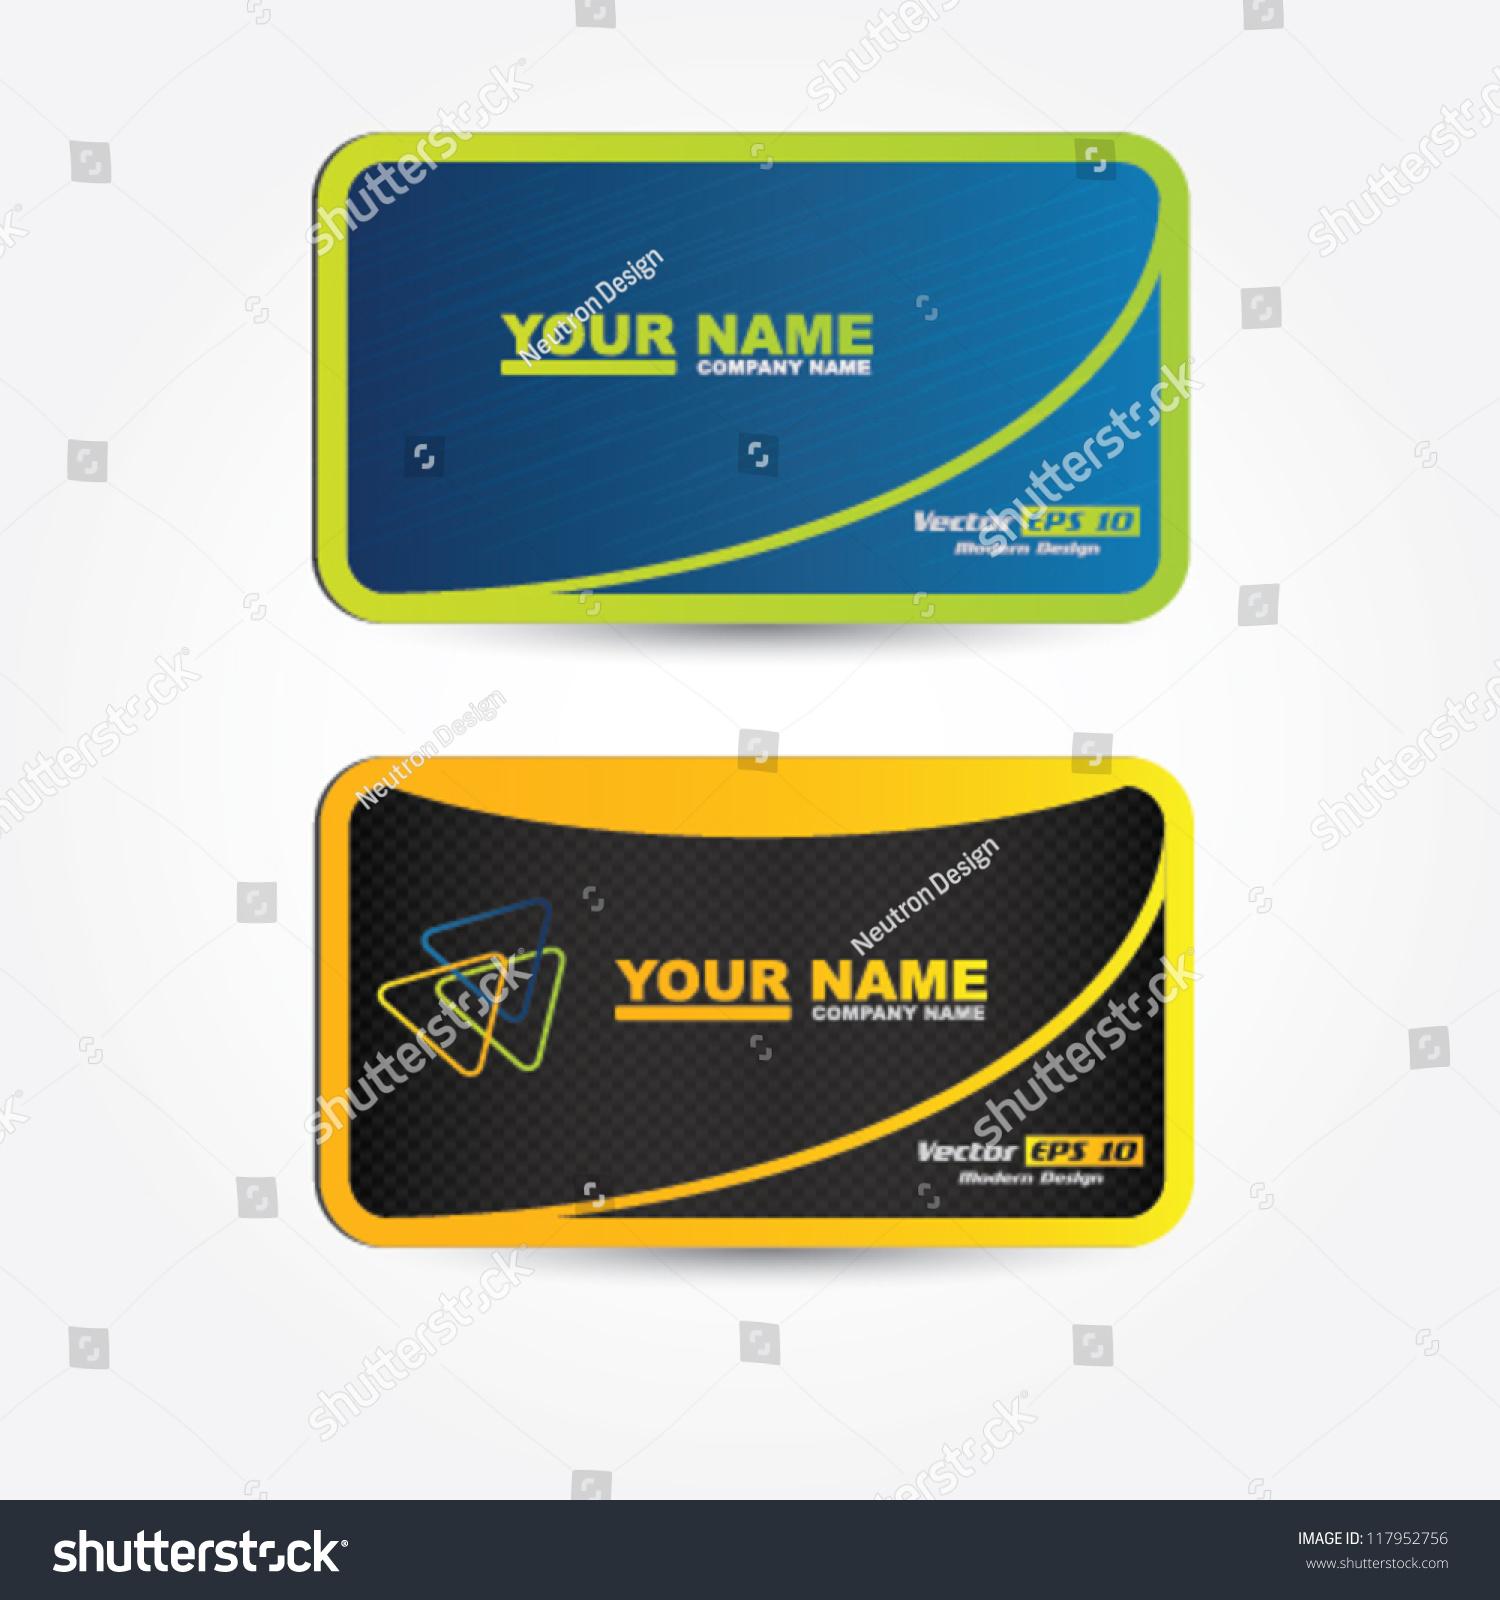 Vector Modern Business Card Design Stock Vector HD (Royalty Free ...